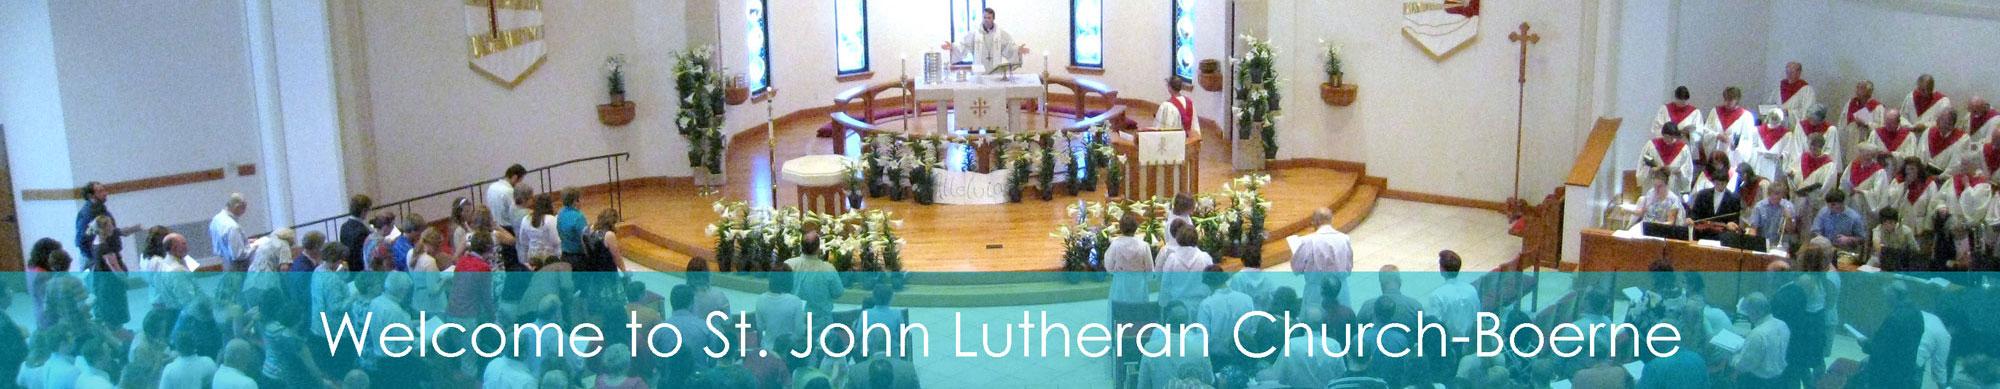 St. John Lutheran Church in Boerne